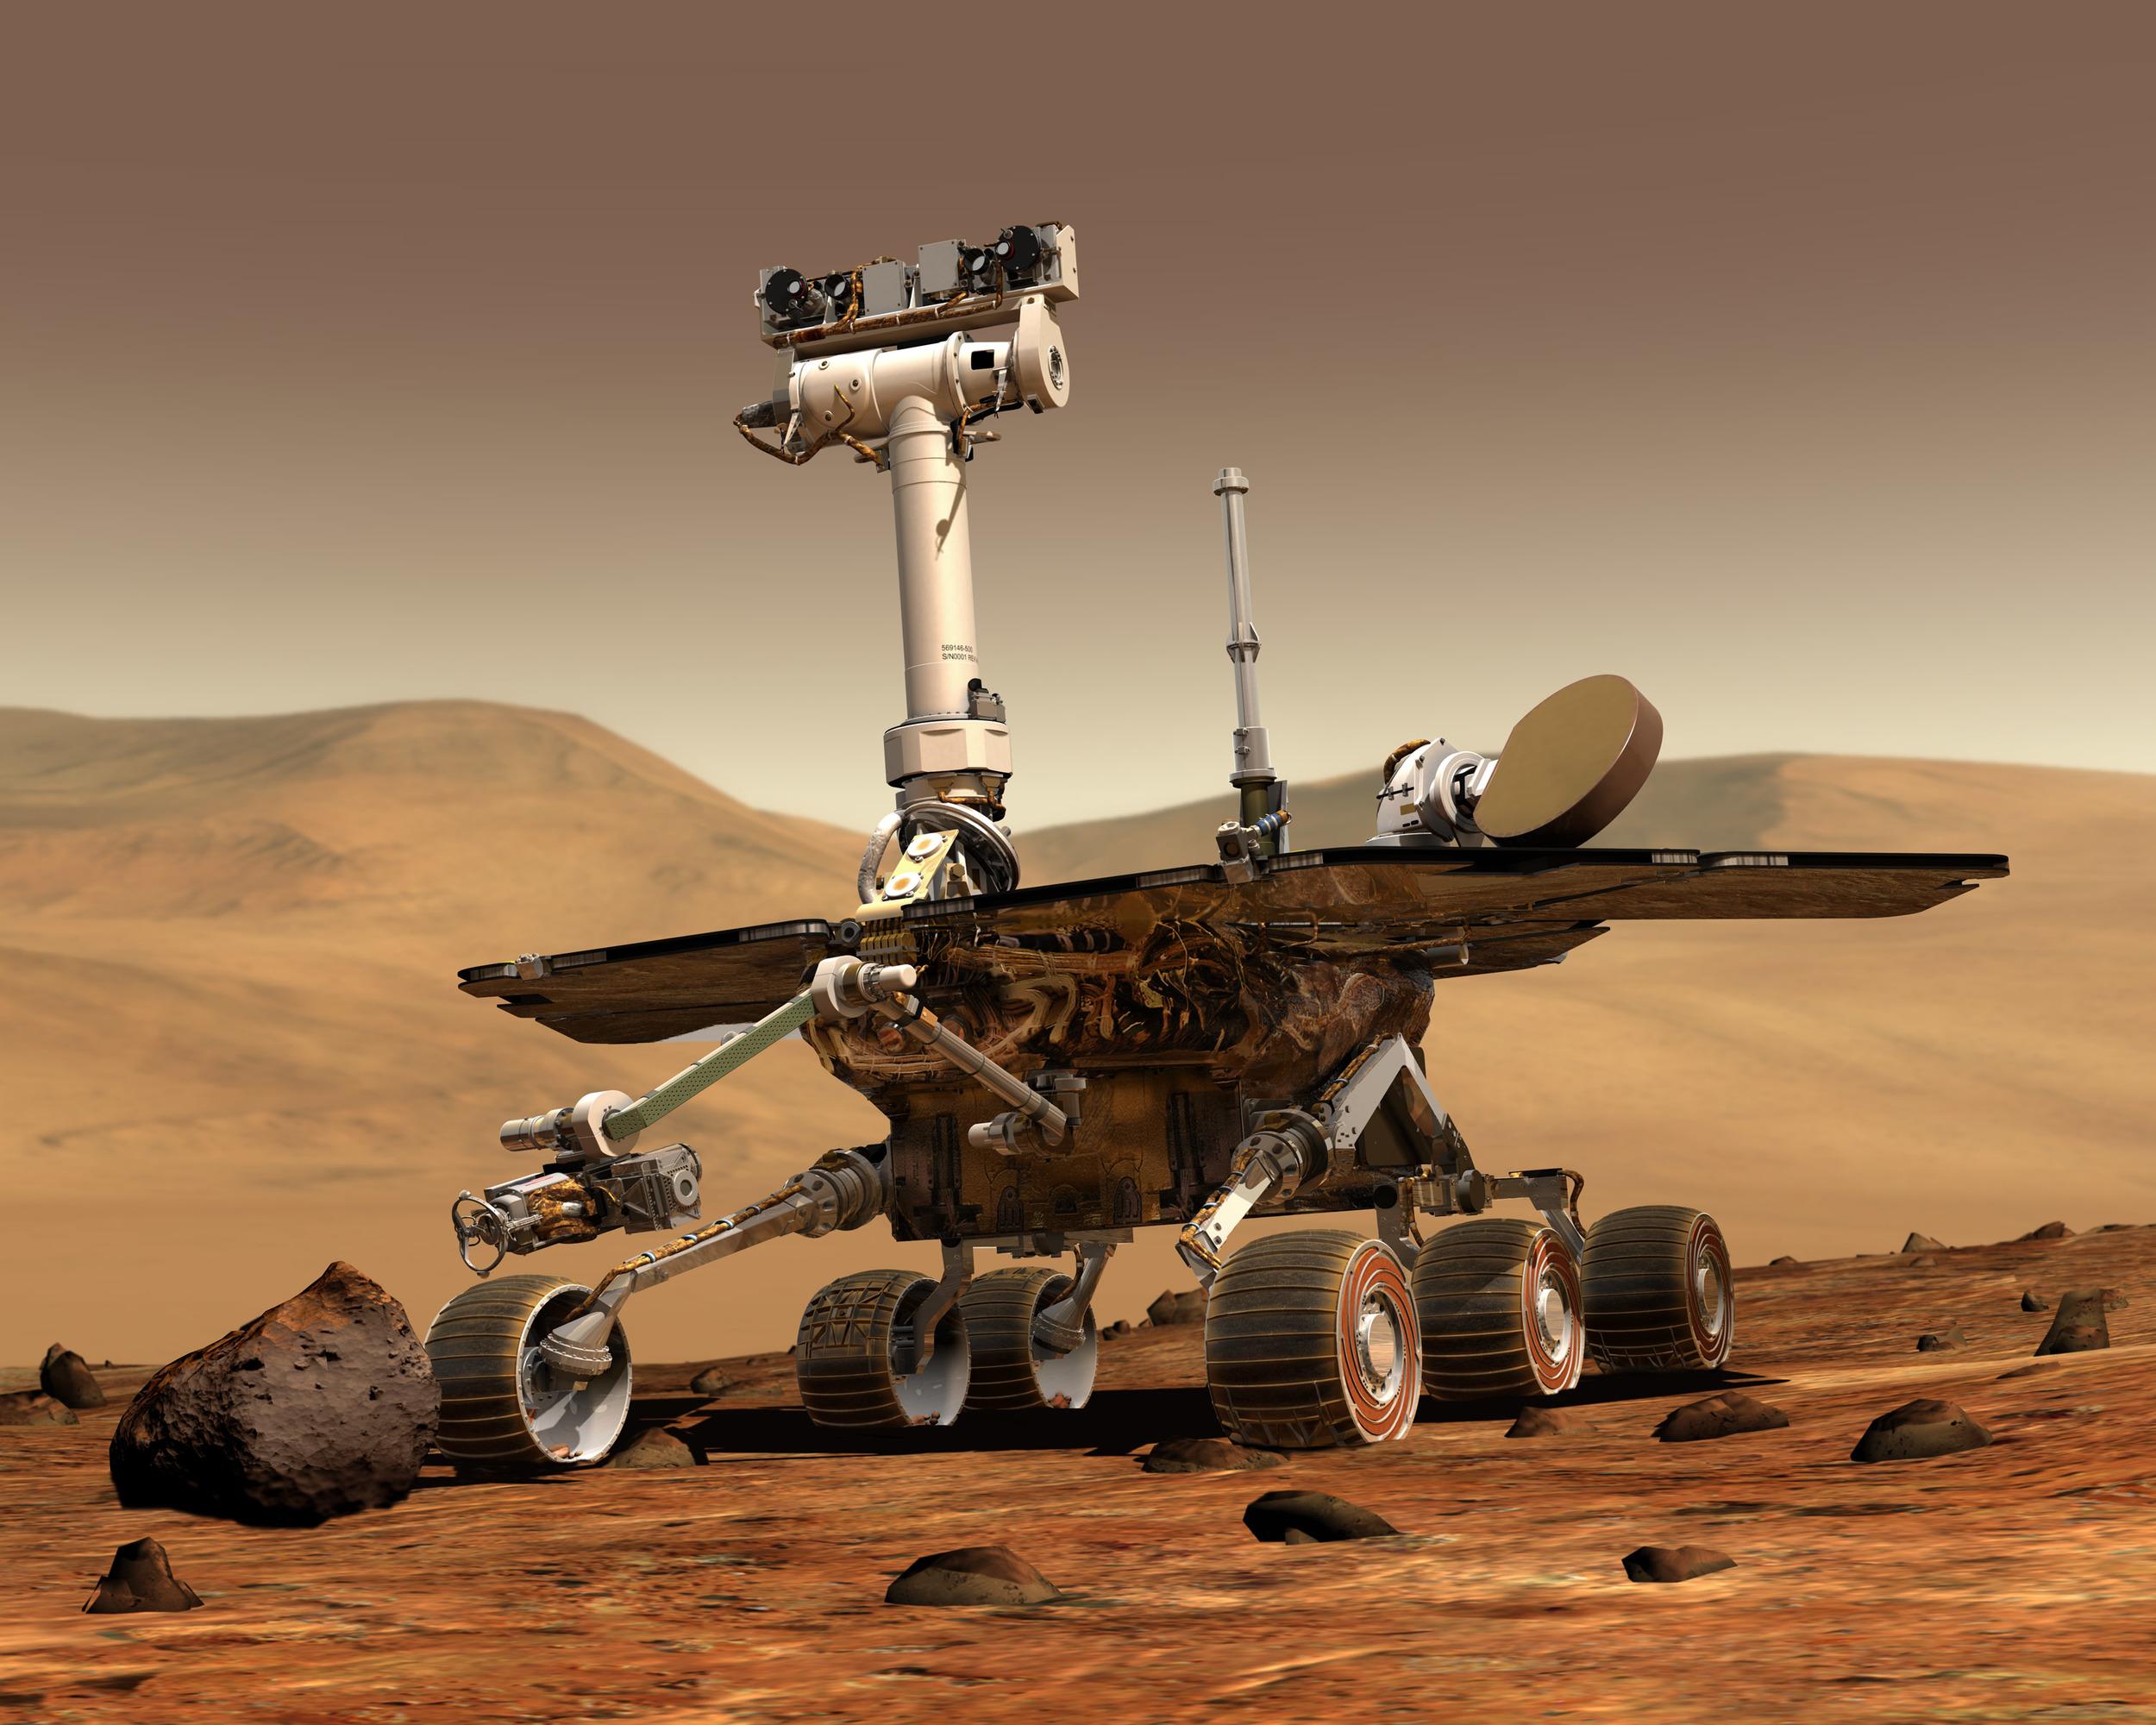 Image Credit: NASA/JPL/Cornell University, 2003-02-26